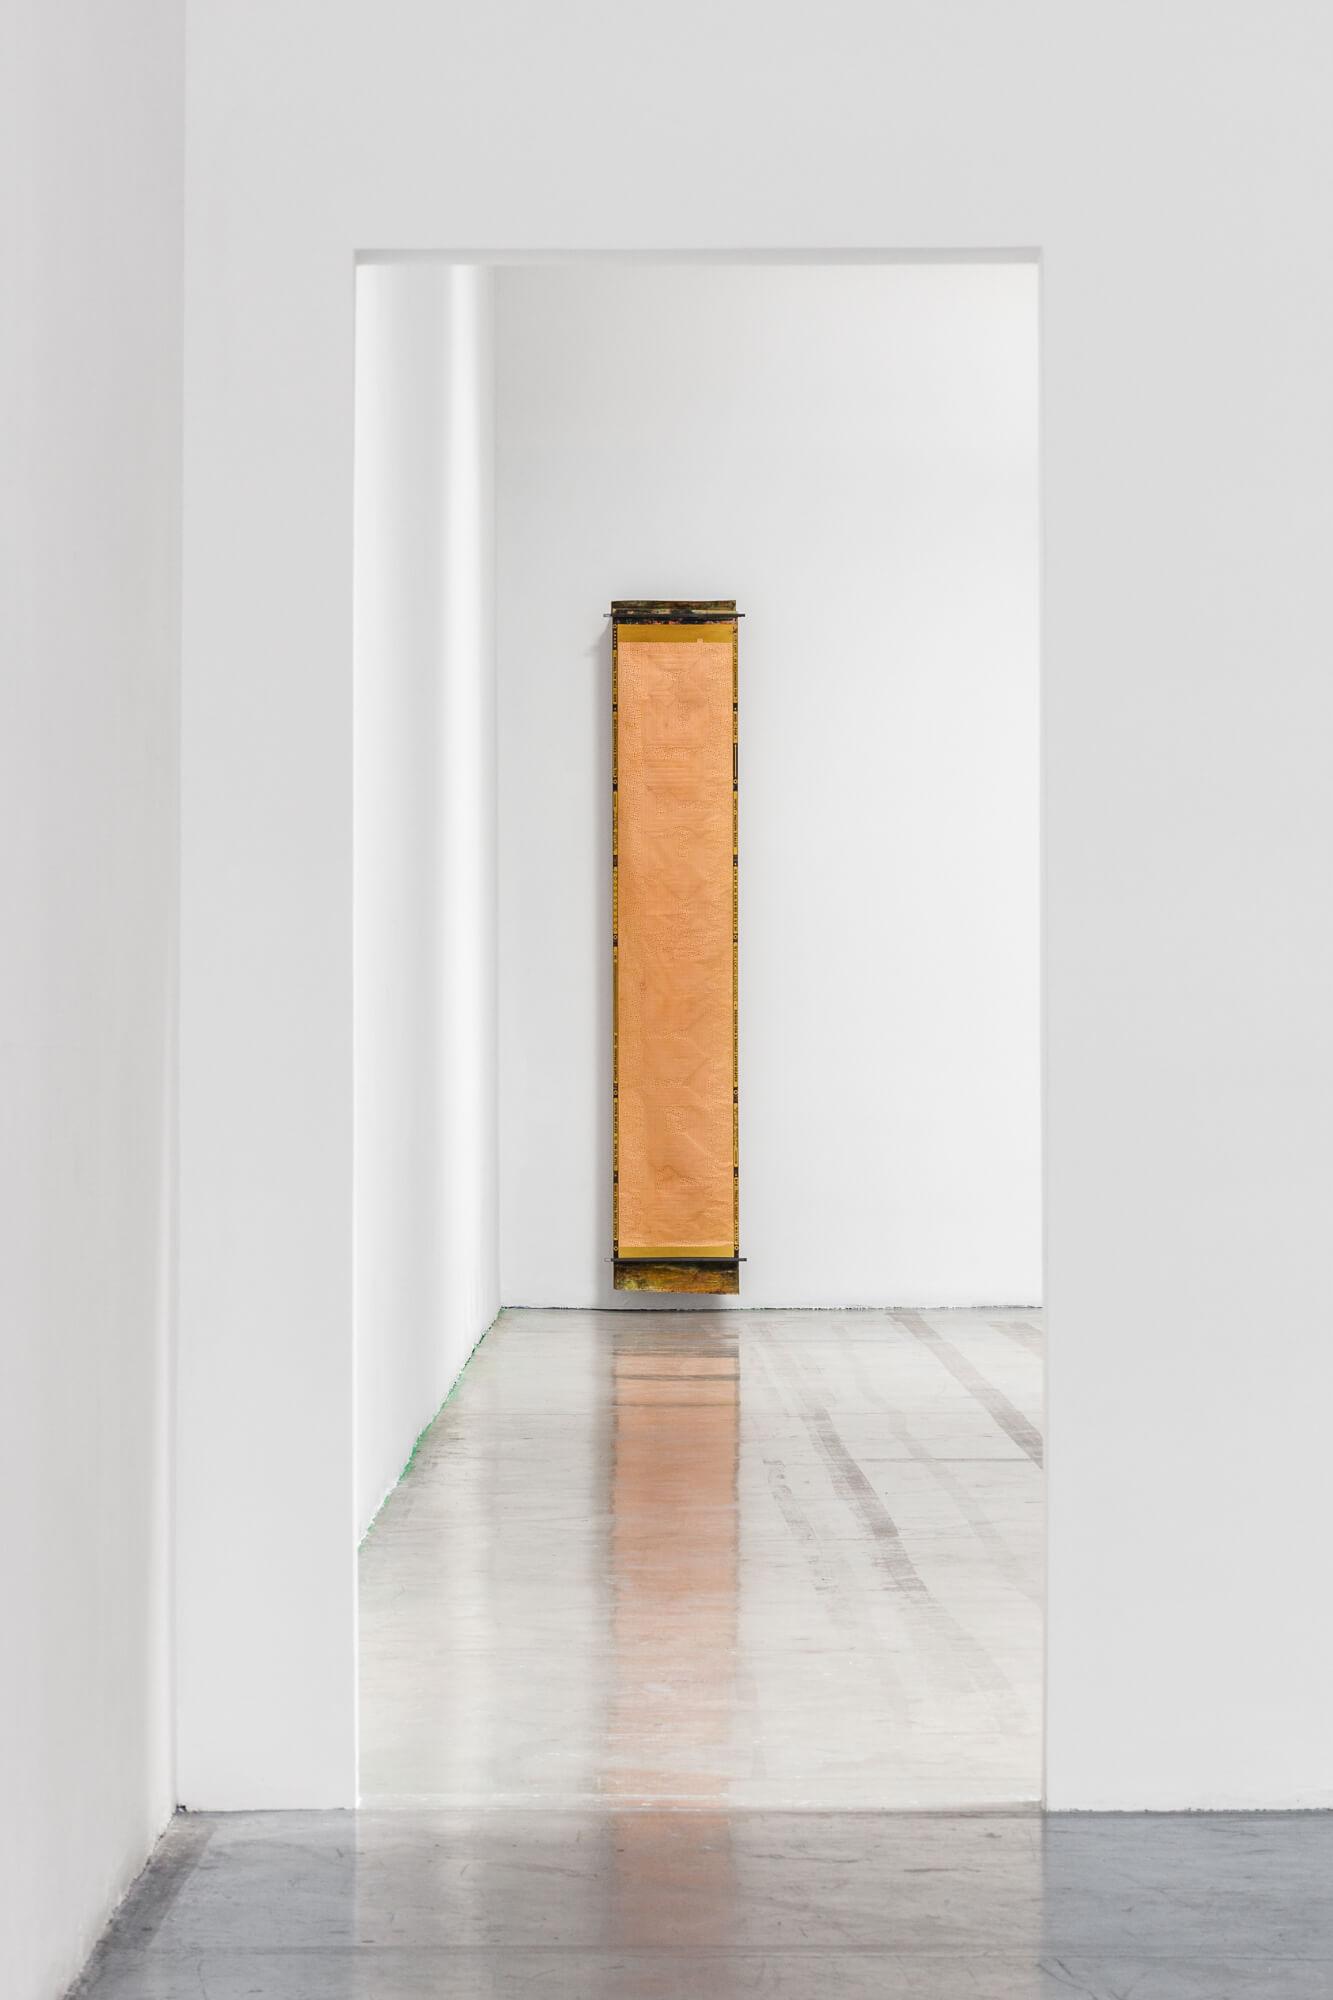 Sam Lewitt: Less Light Warm Words Swiss Institute